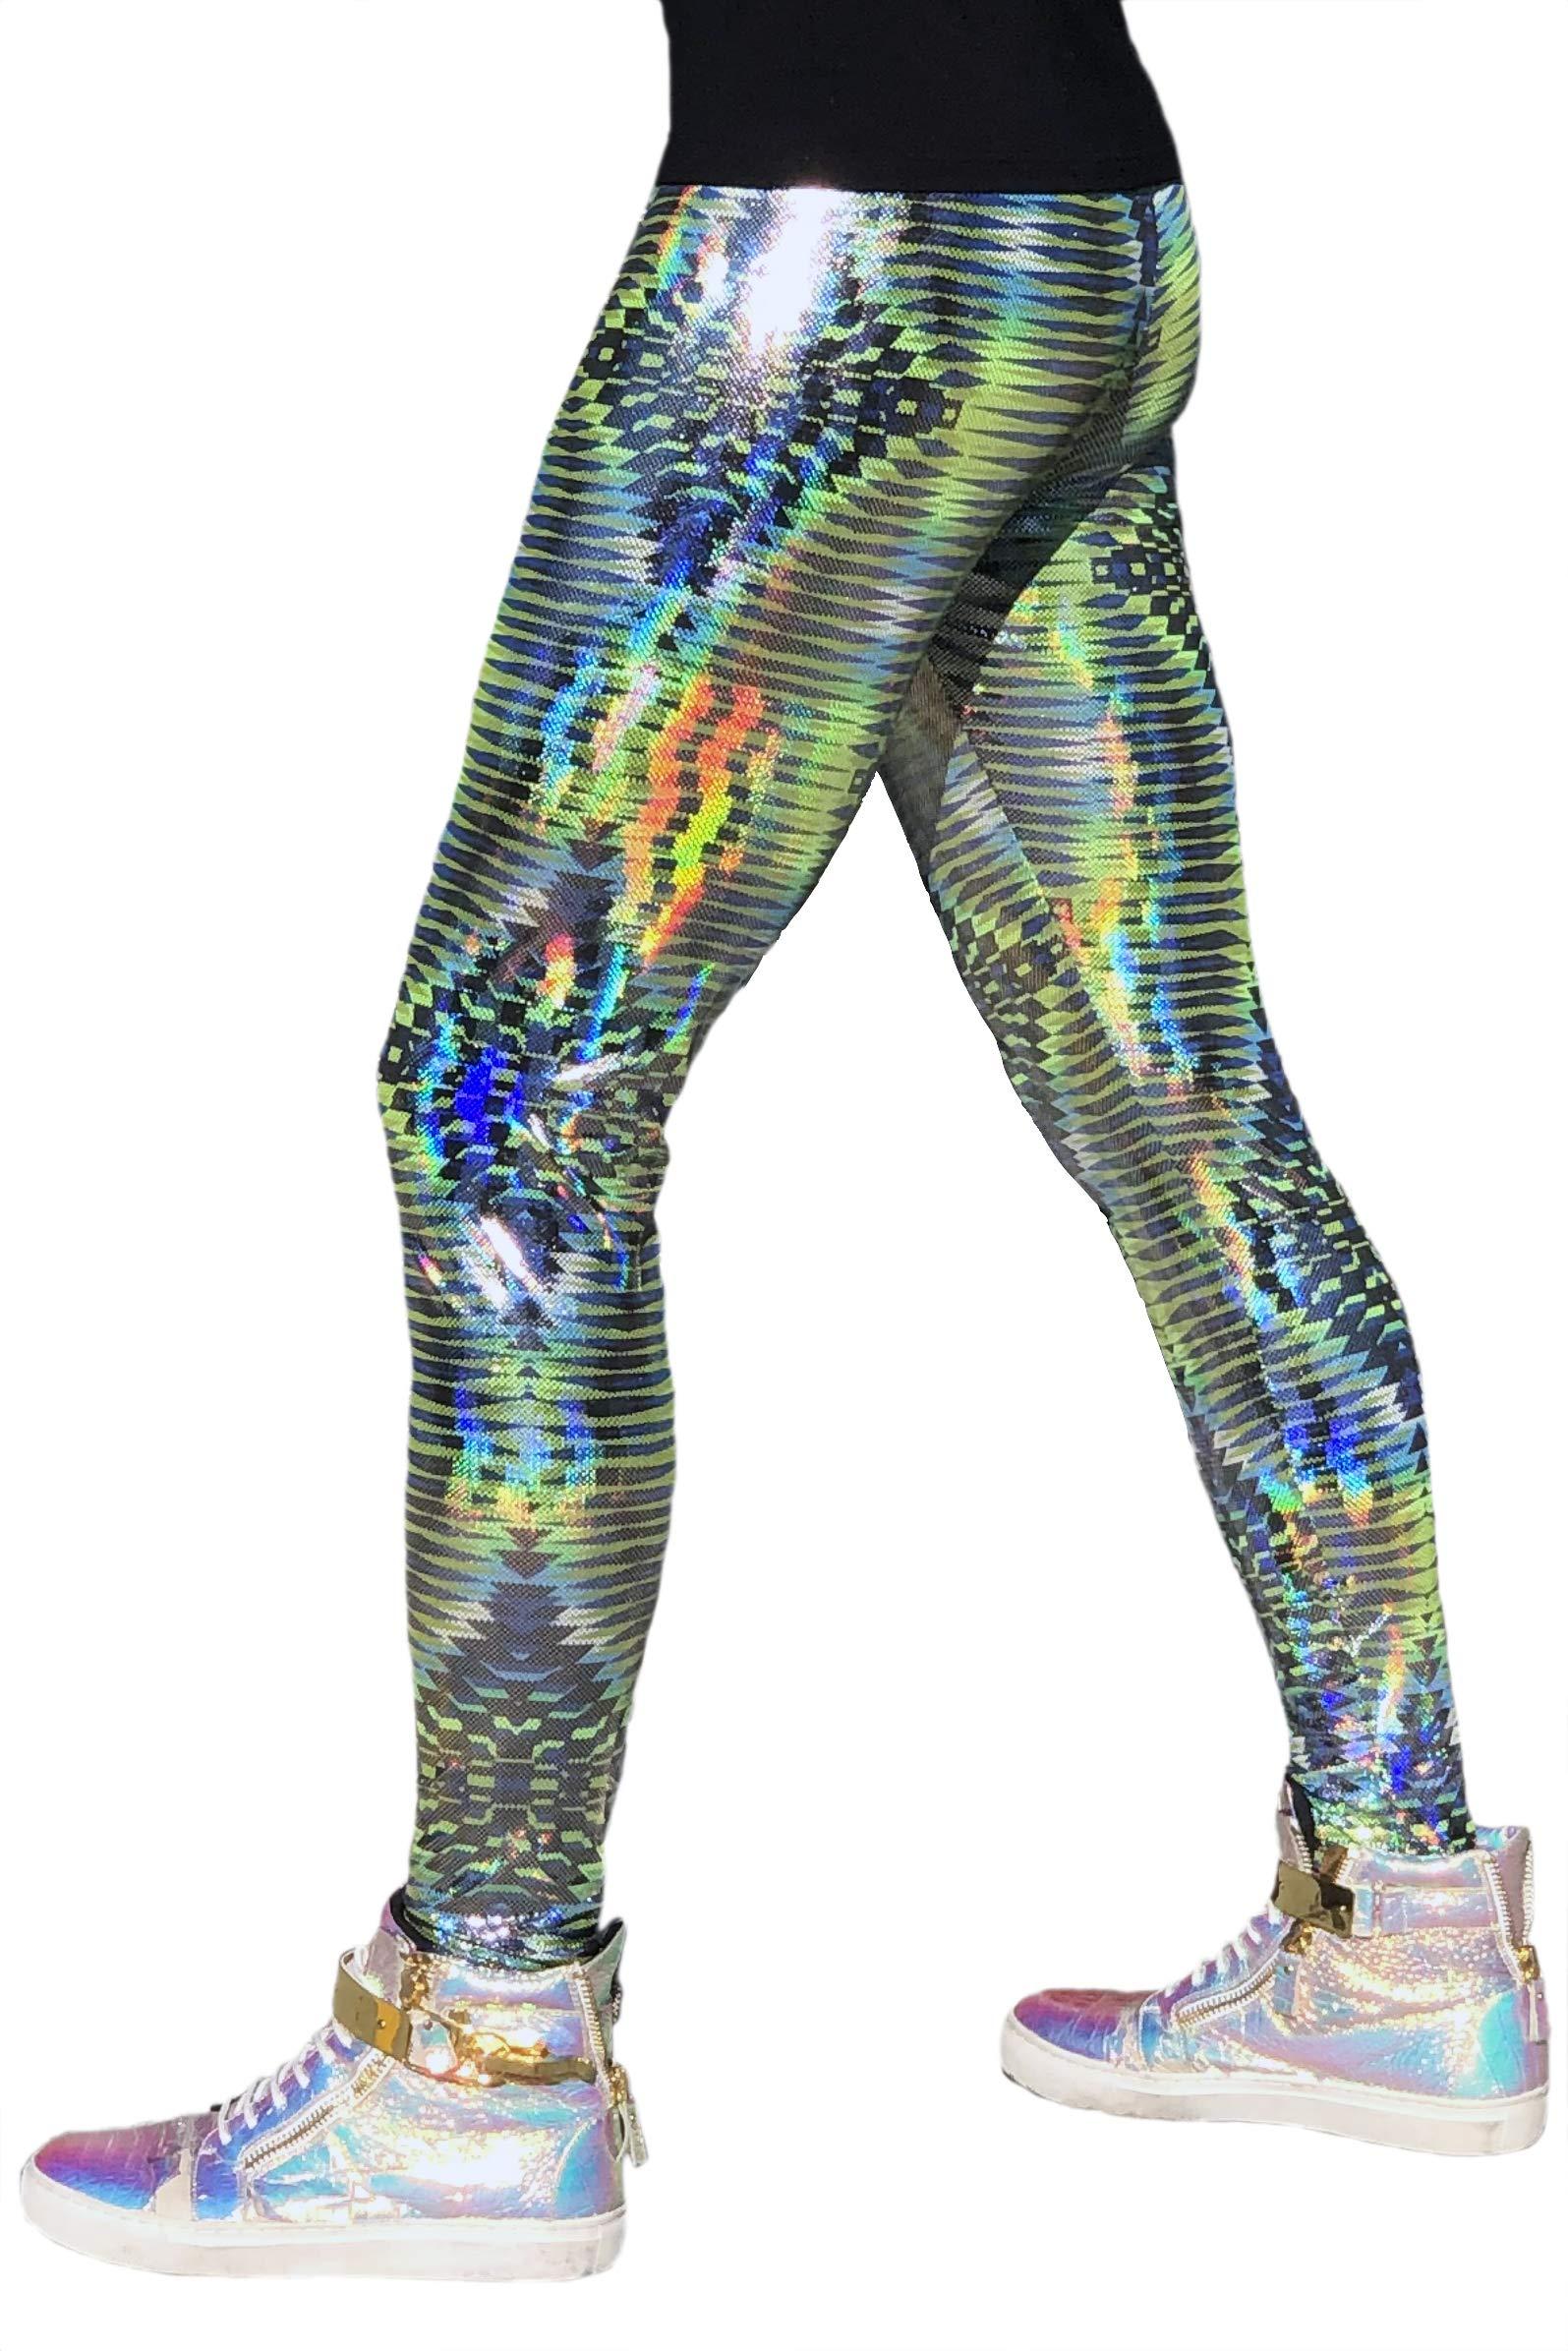 Revolver Fashion Holographic Meggings: USA Made Men's Disco Leggings. Fun Music Festival Clothing (Dazzle Green, Large) by Revolver Fashion